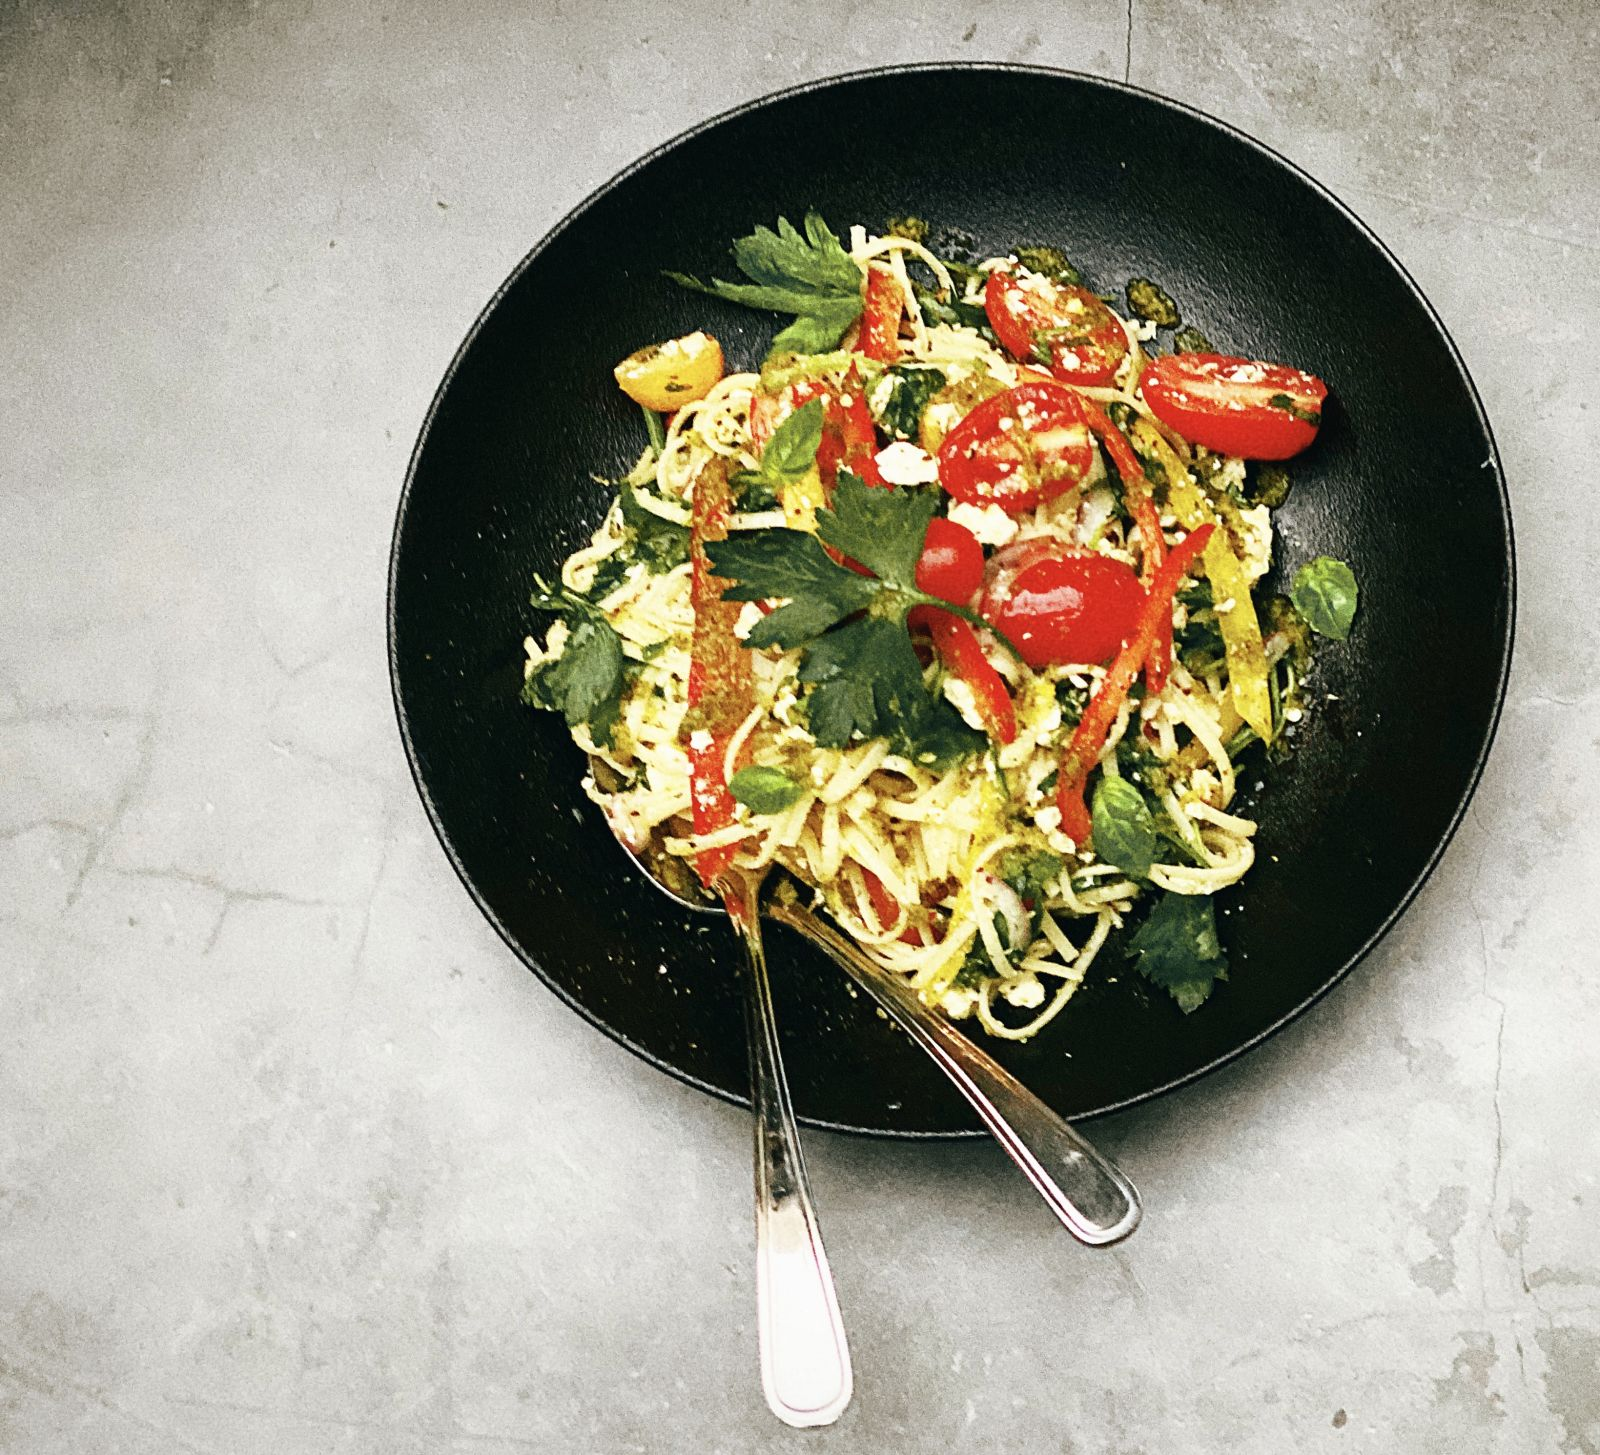 Warm pasta salad with soft feta